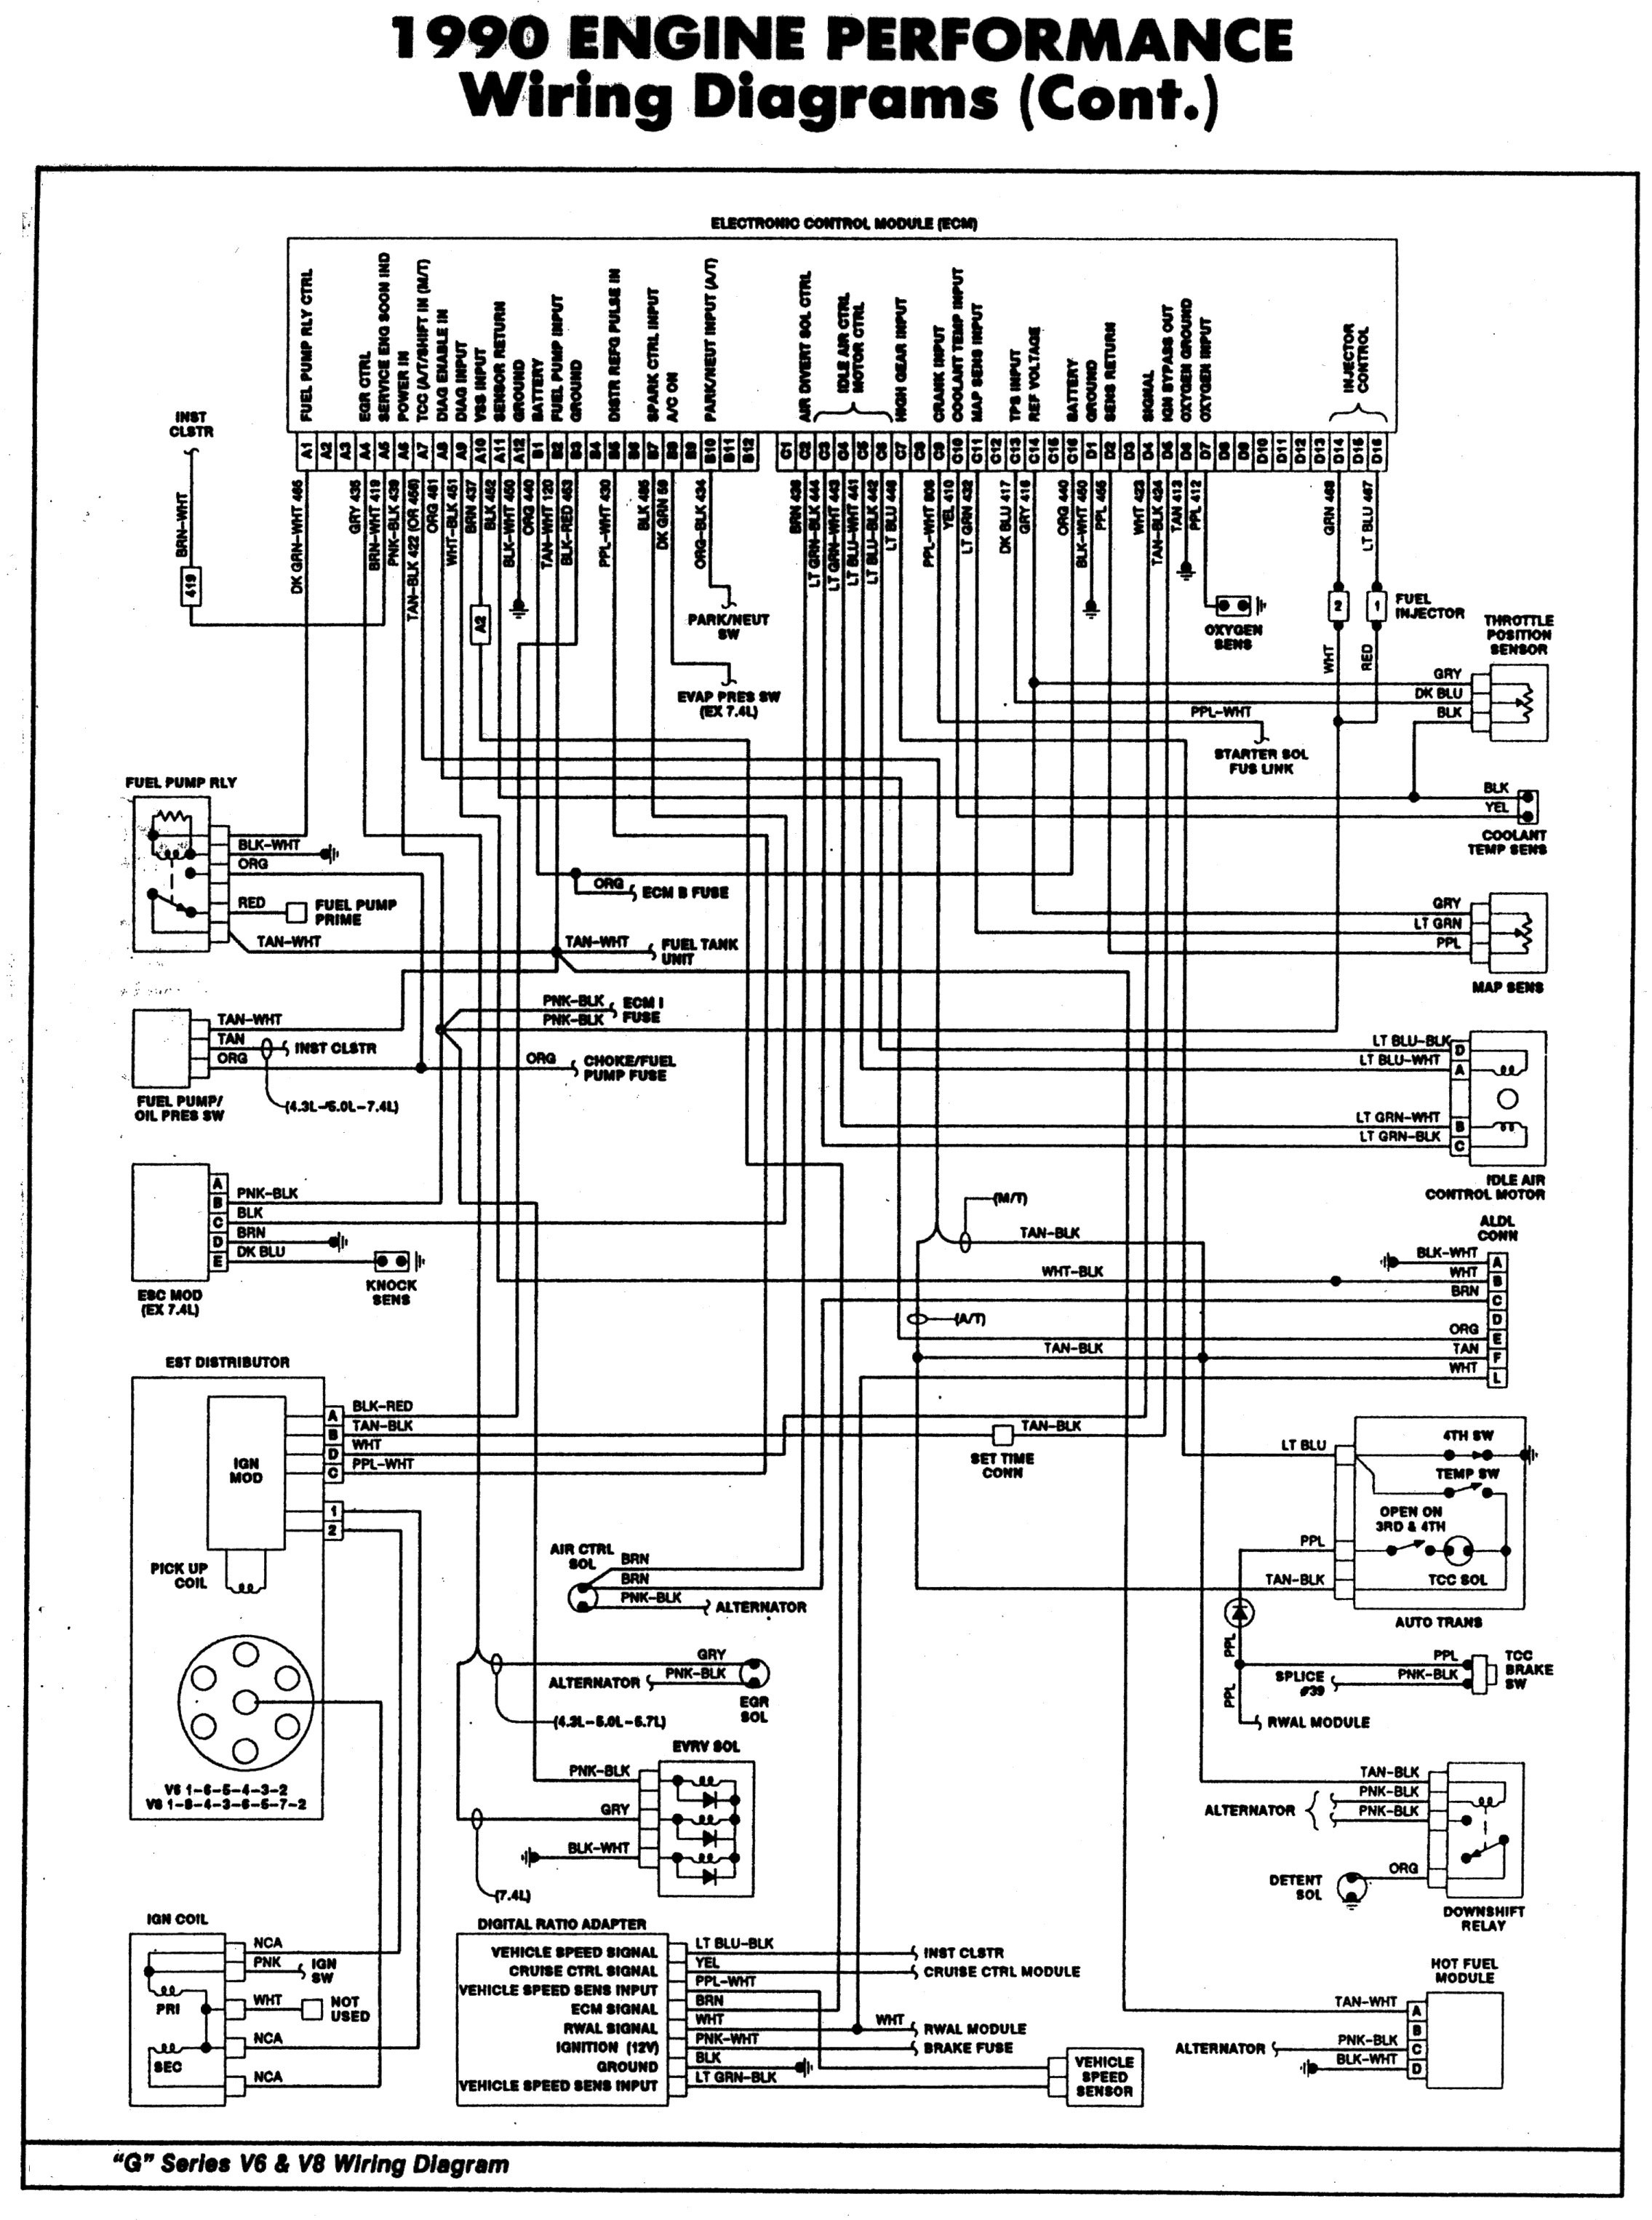 2008 Dodge Grand Caravan Engine Diagram My Wiring 2006 99 Ac For Share U2022 Rh Agp Cx192 2007